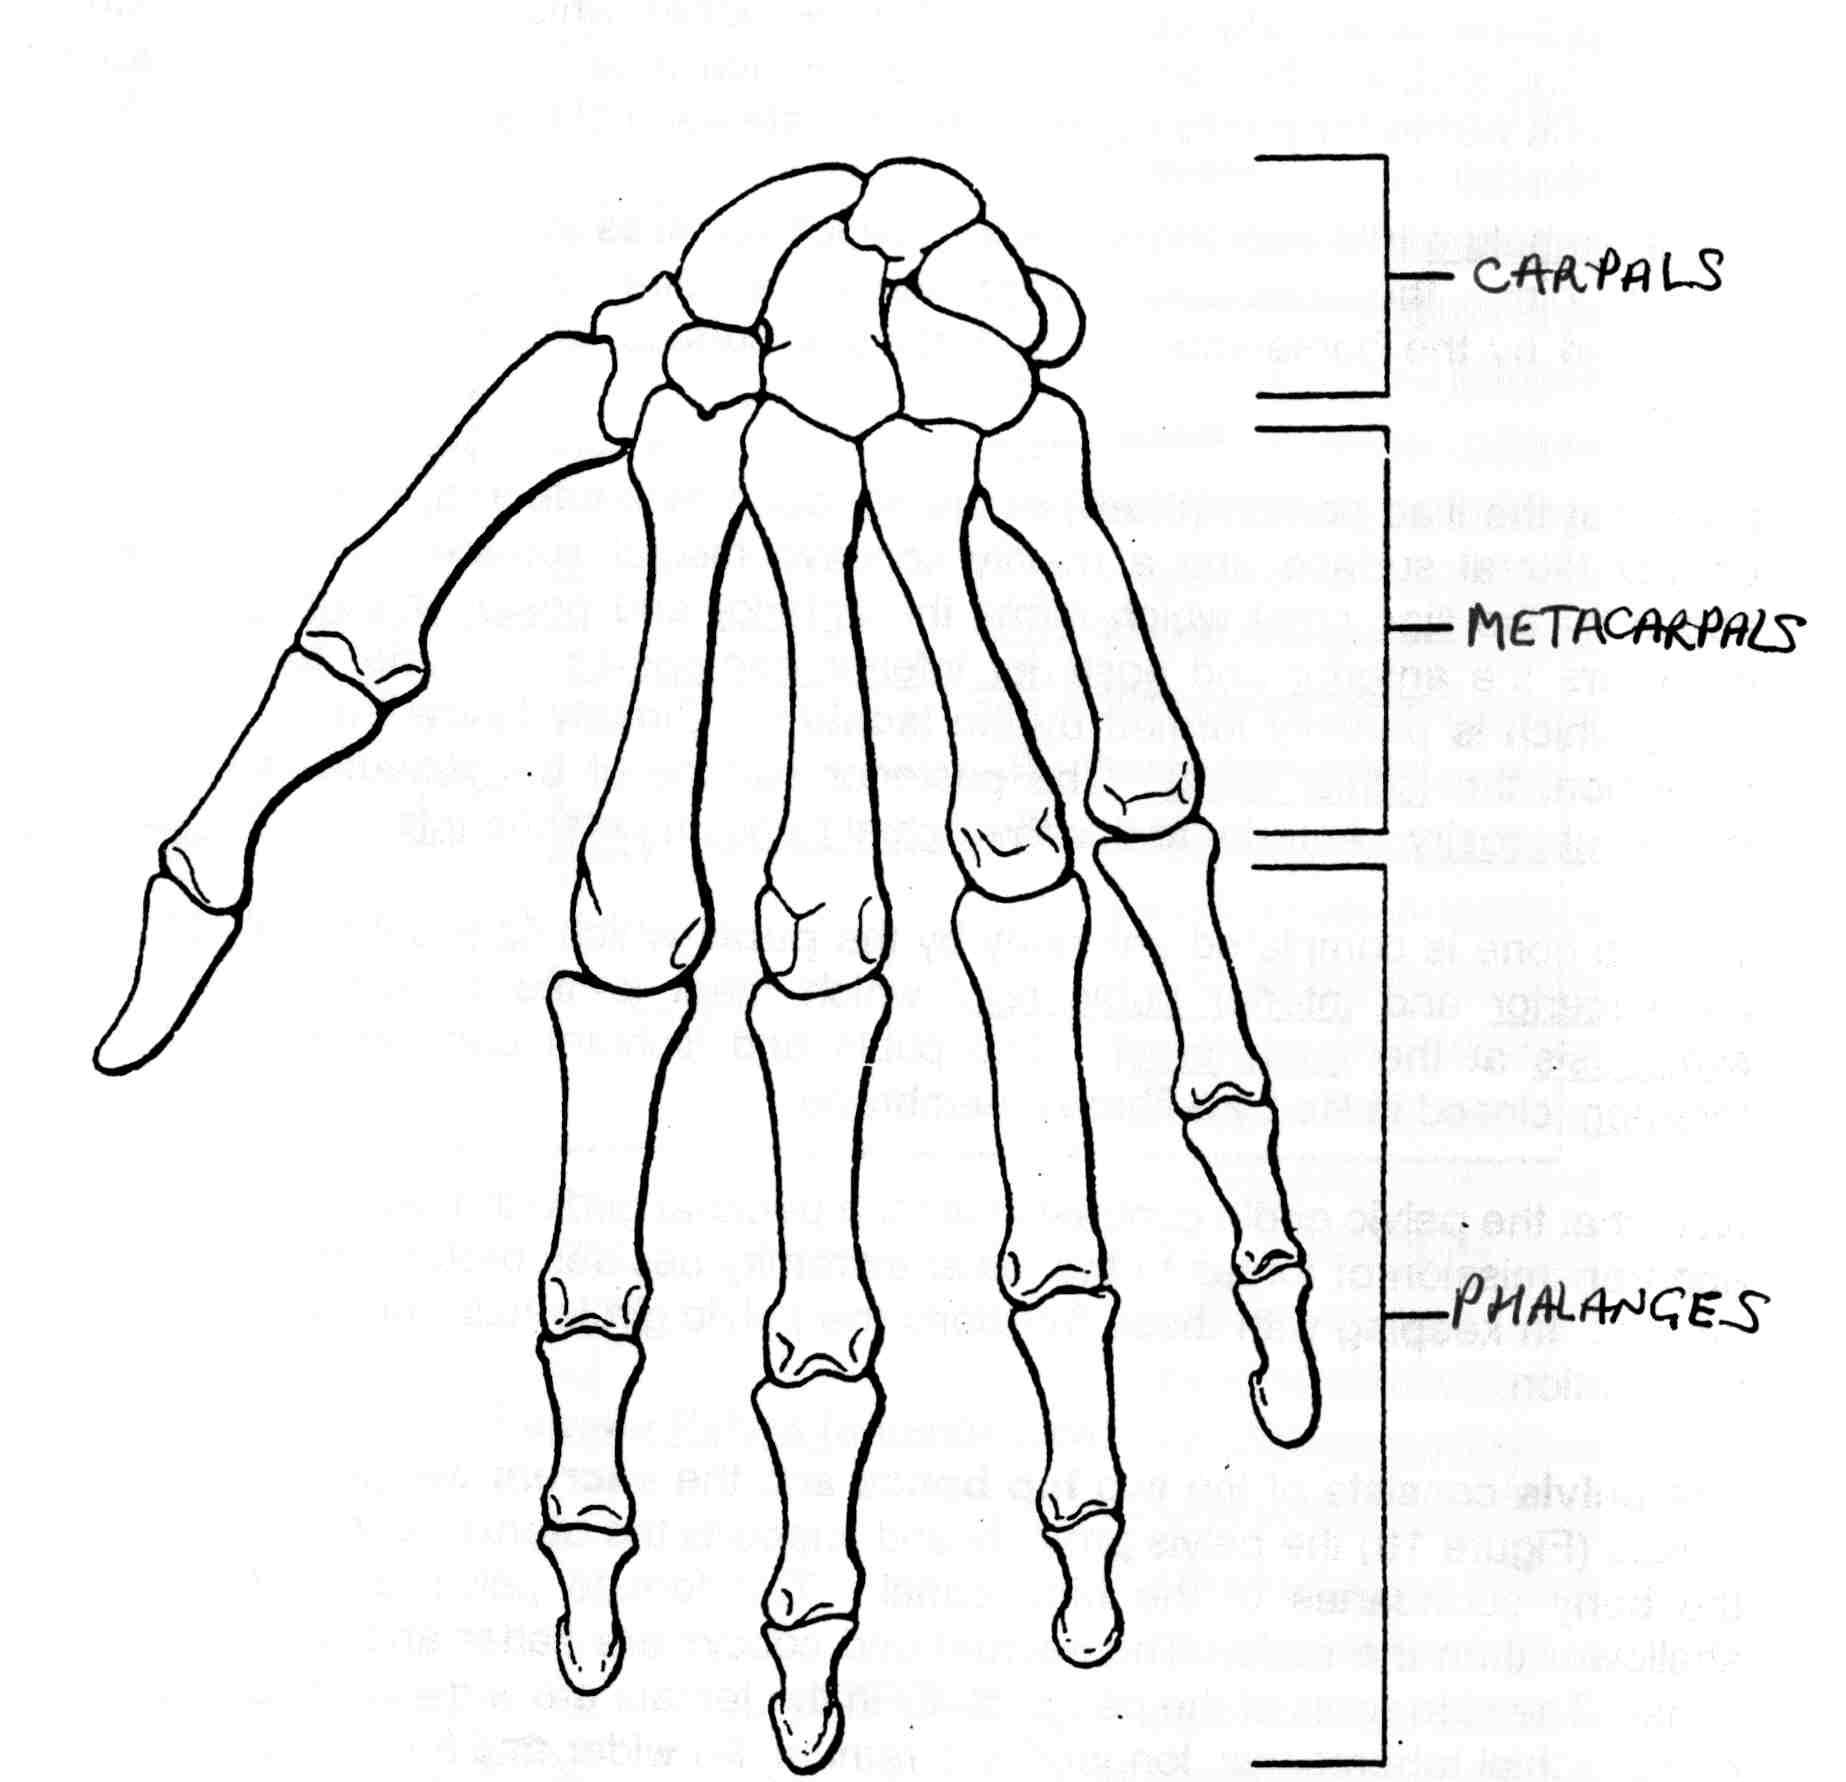 Hand Bone Drawing At Getdrawings